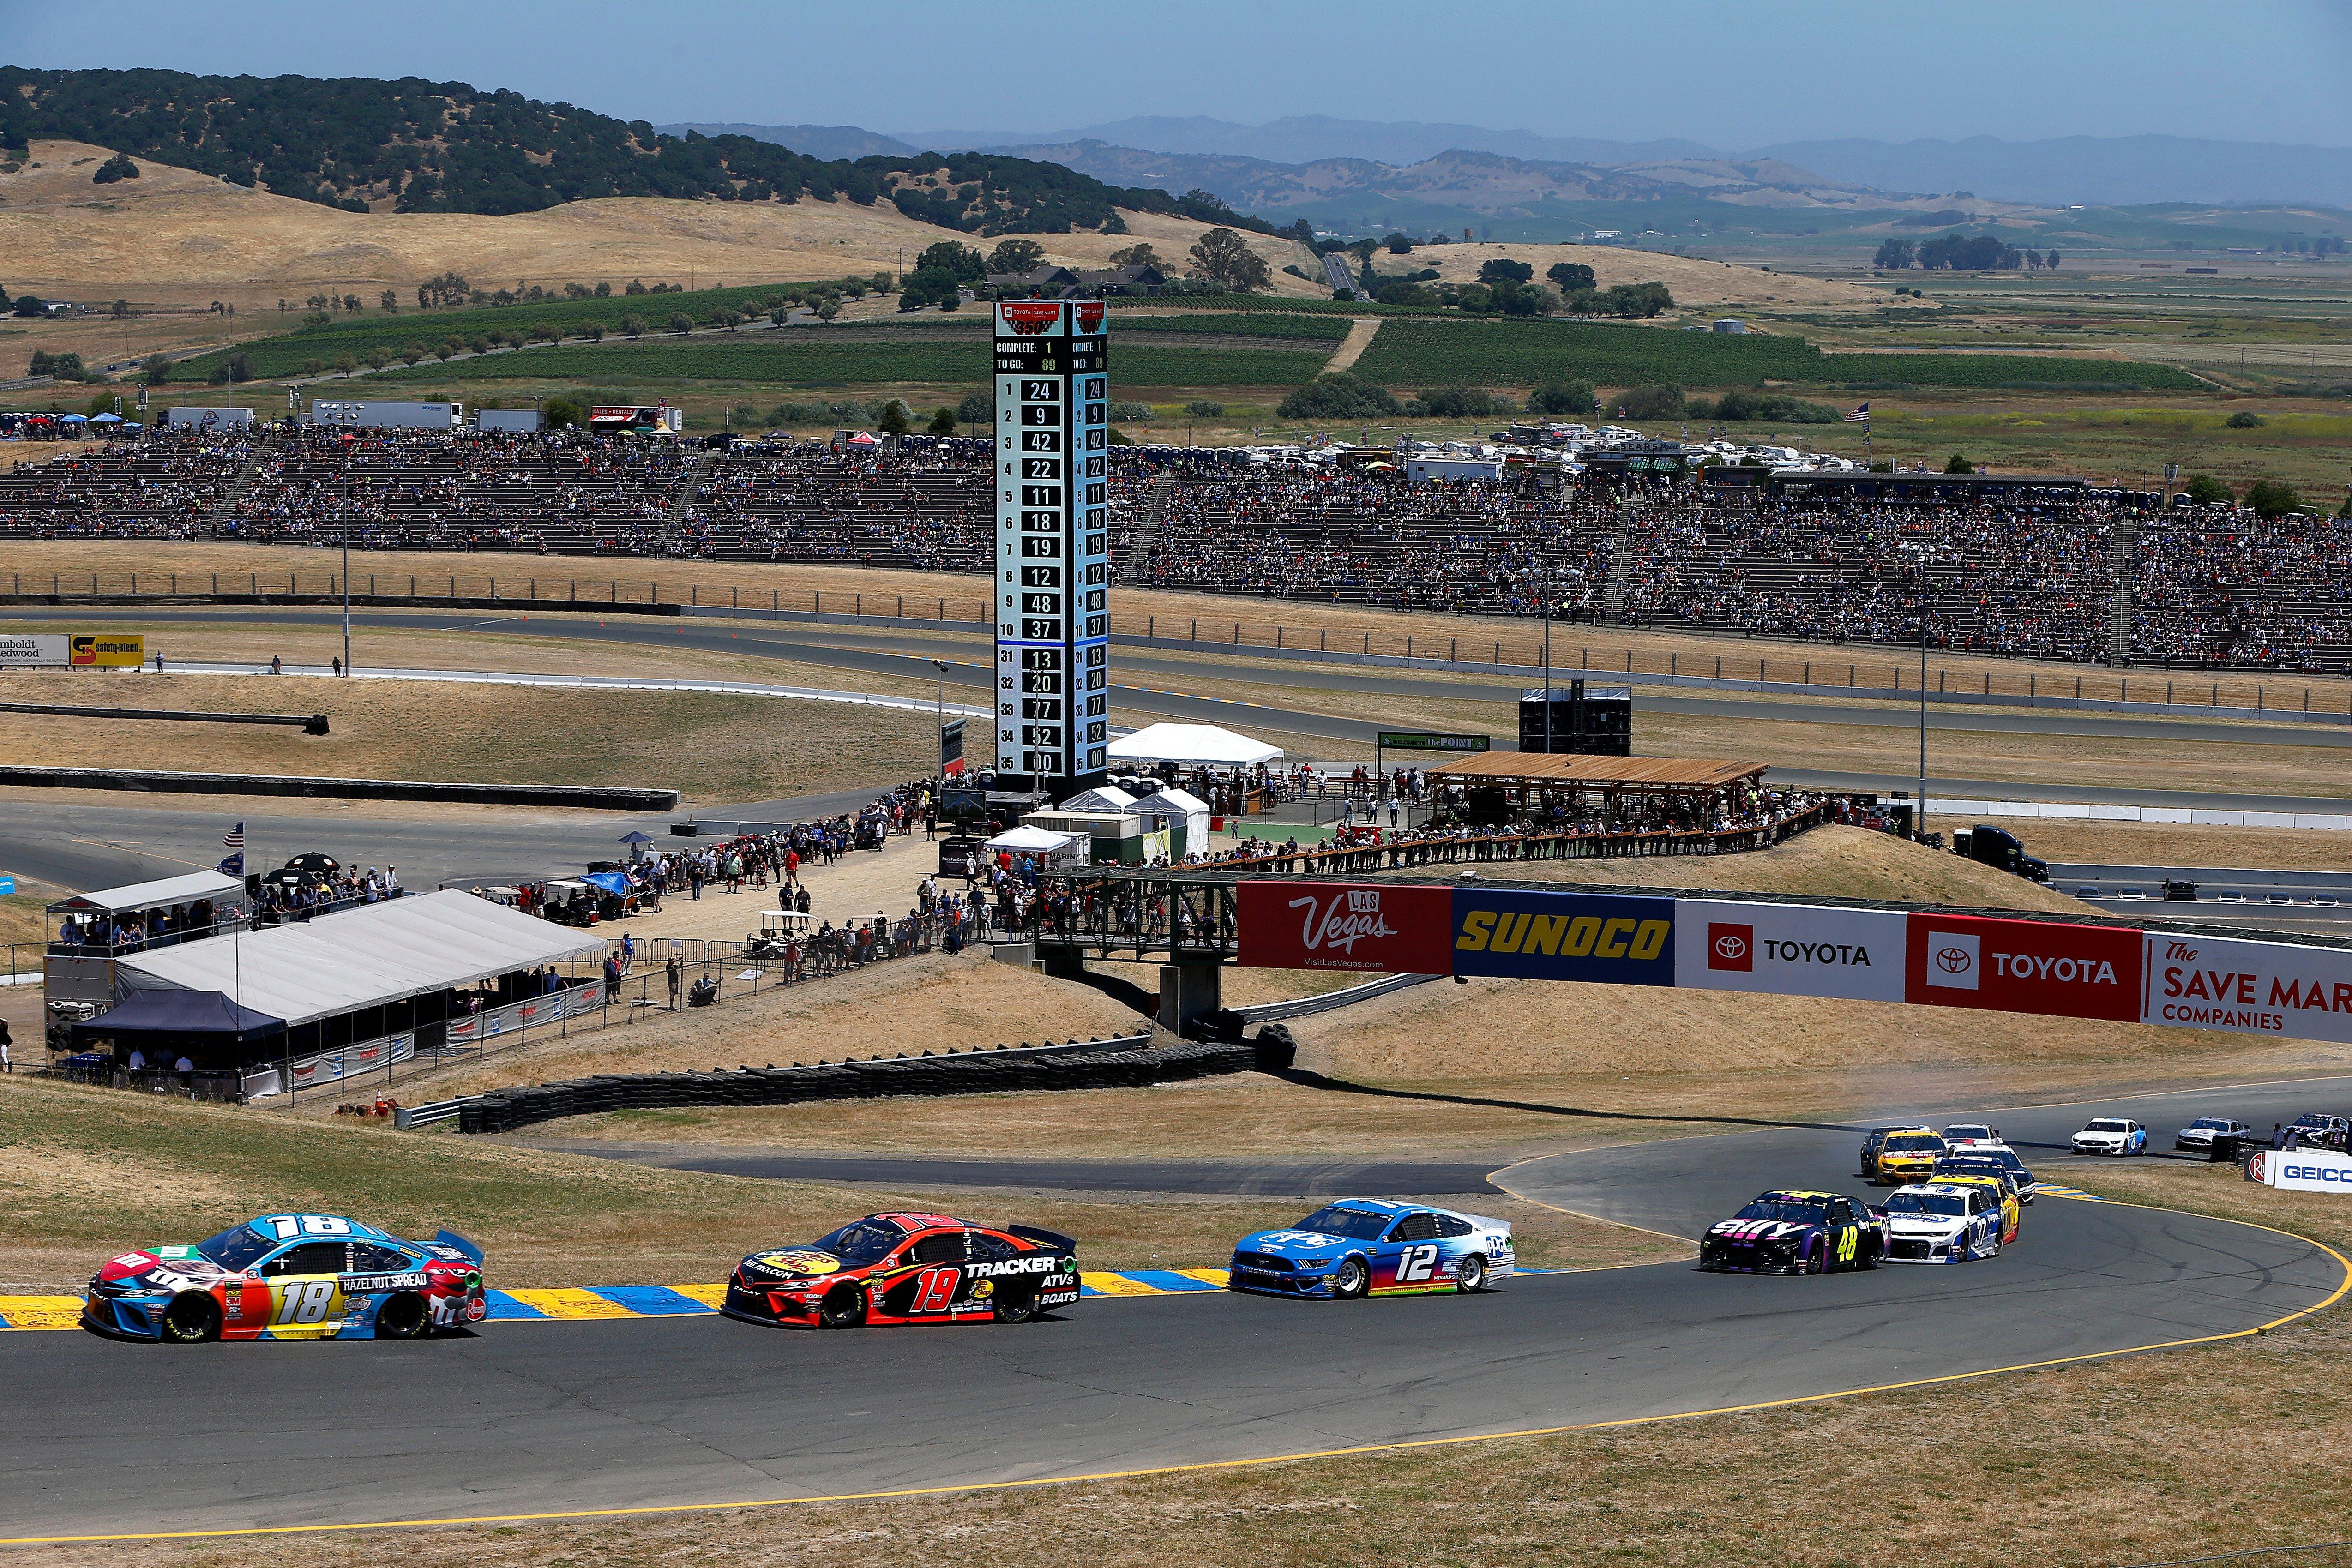 Kyle Busch, Martin Truex Jr and Ryan Blaney at Sonoma Raceway - NASCAR Road Course